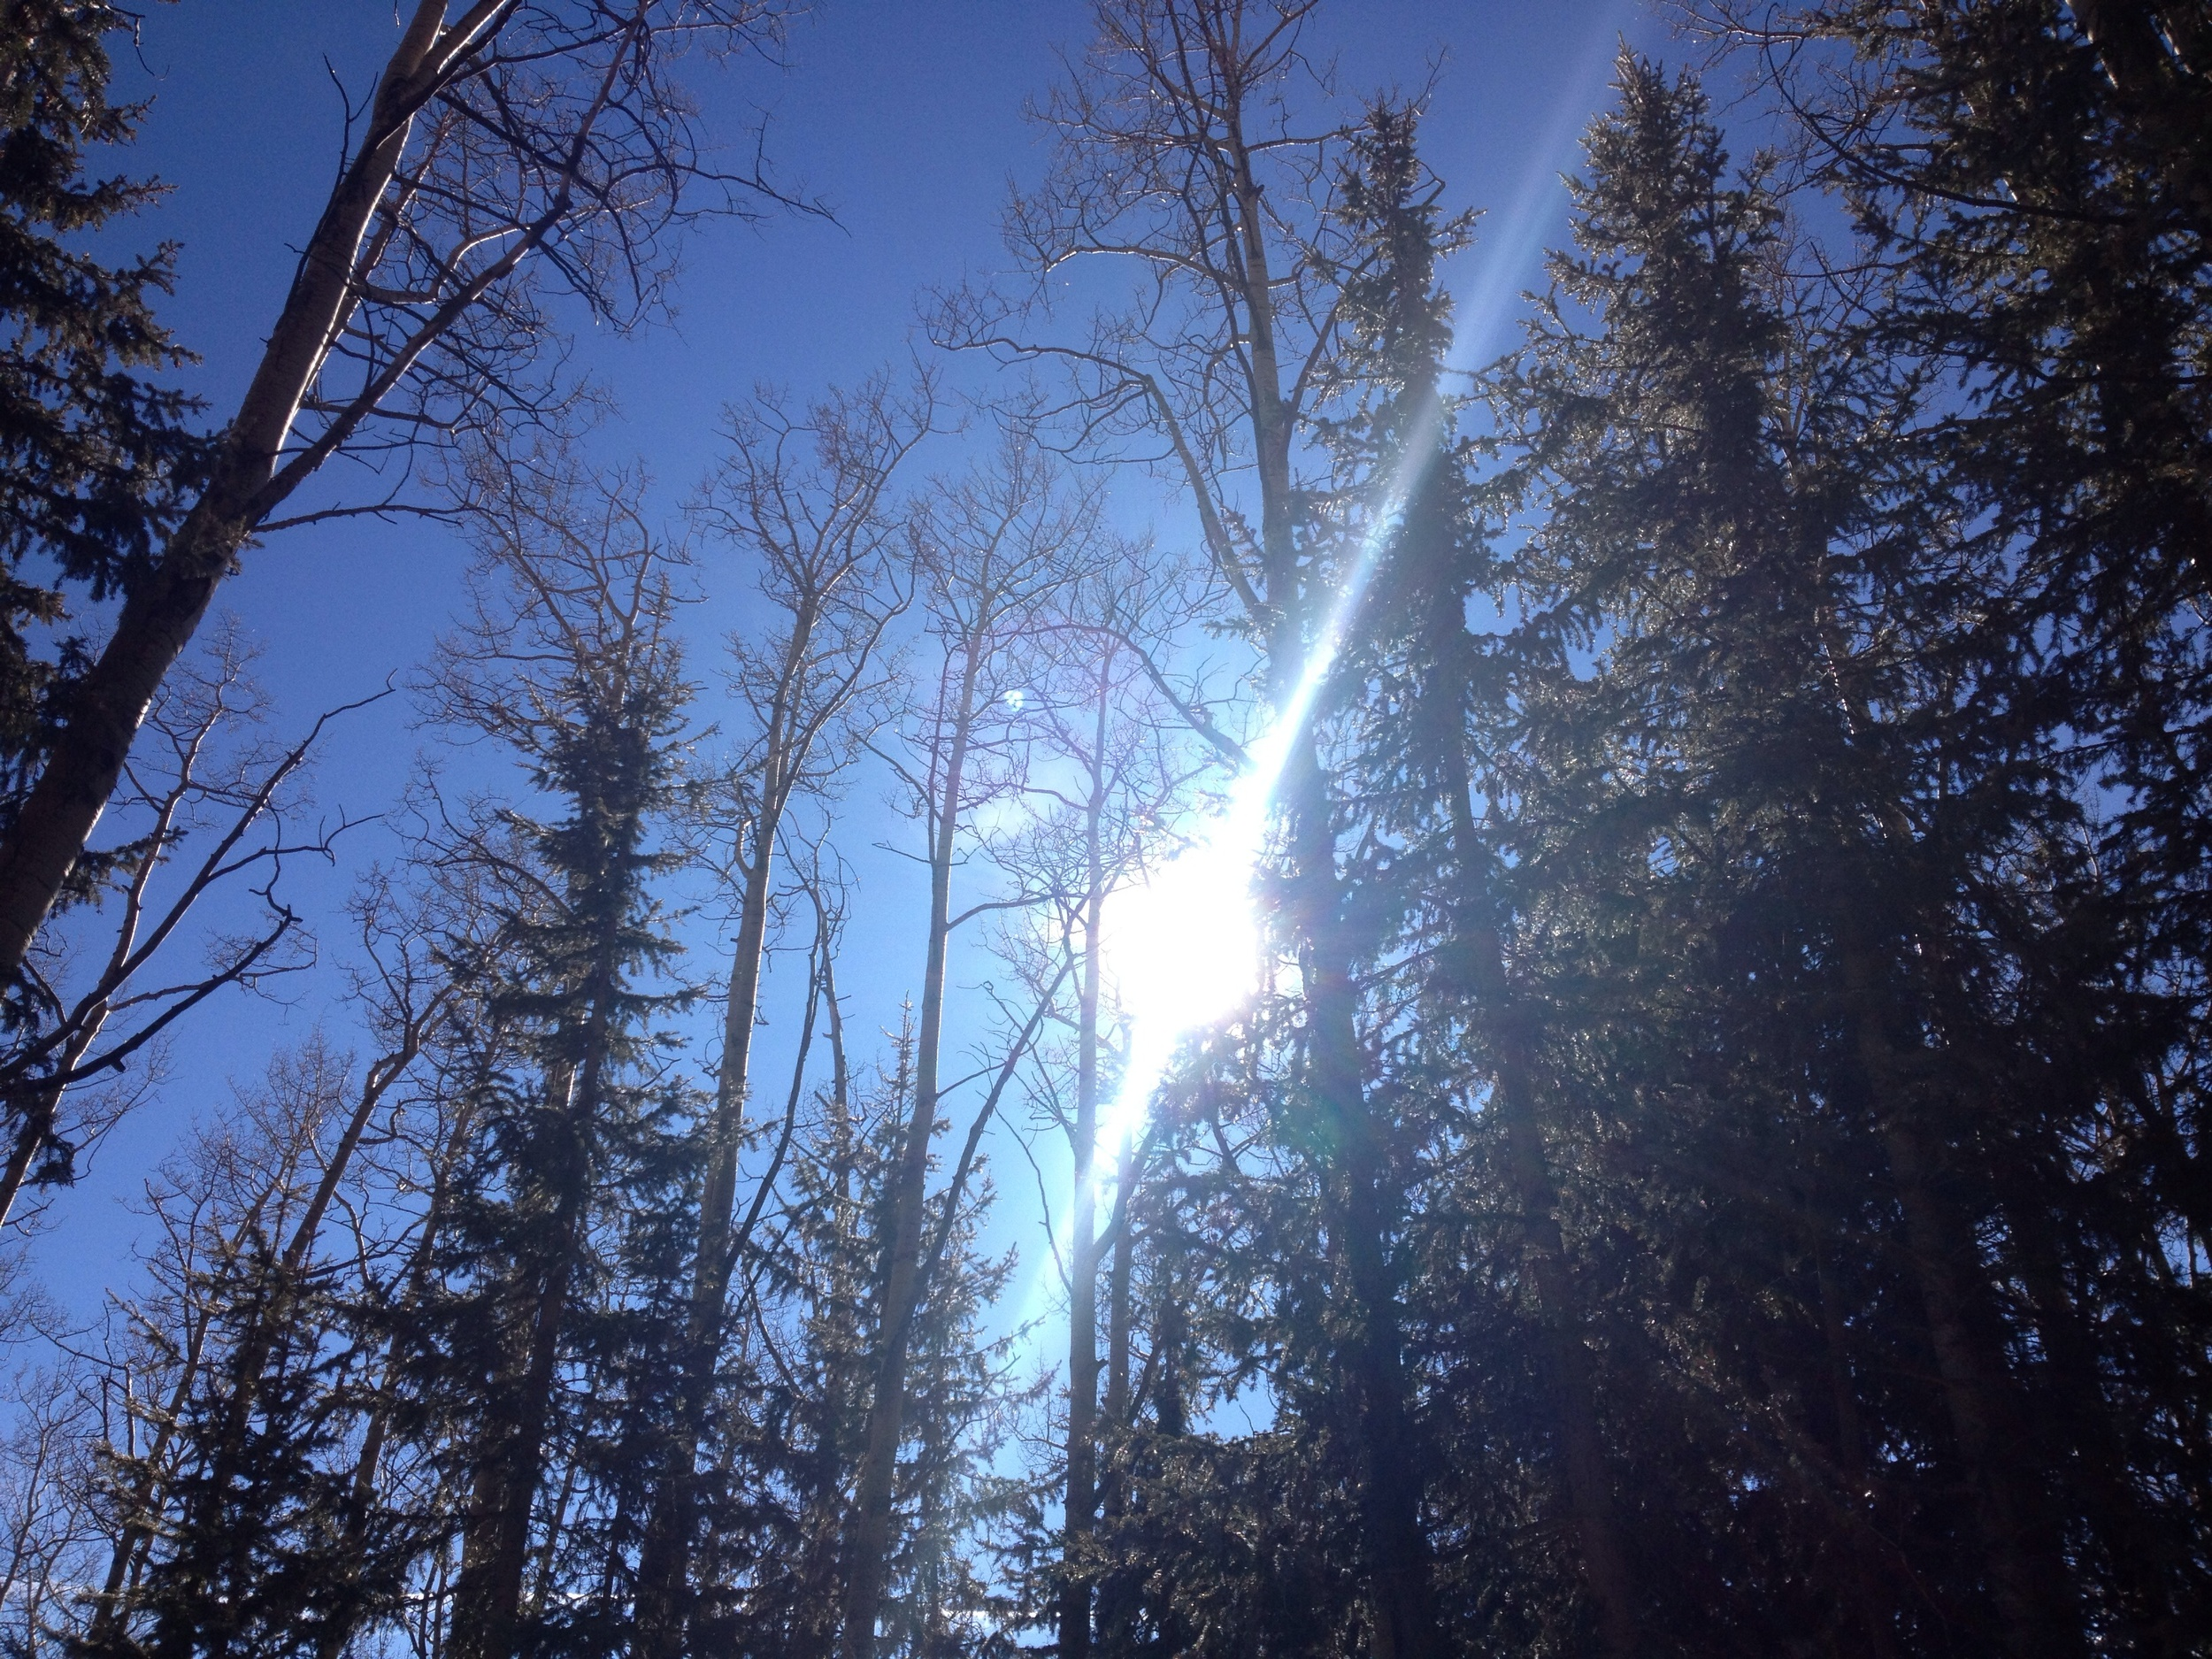 On Windsor Trail near Santa Fe ski slope...